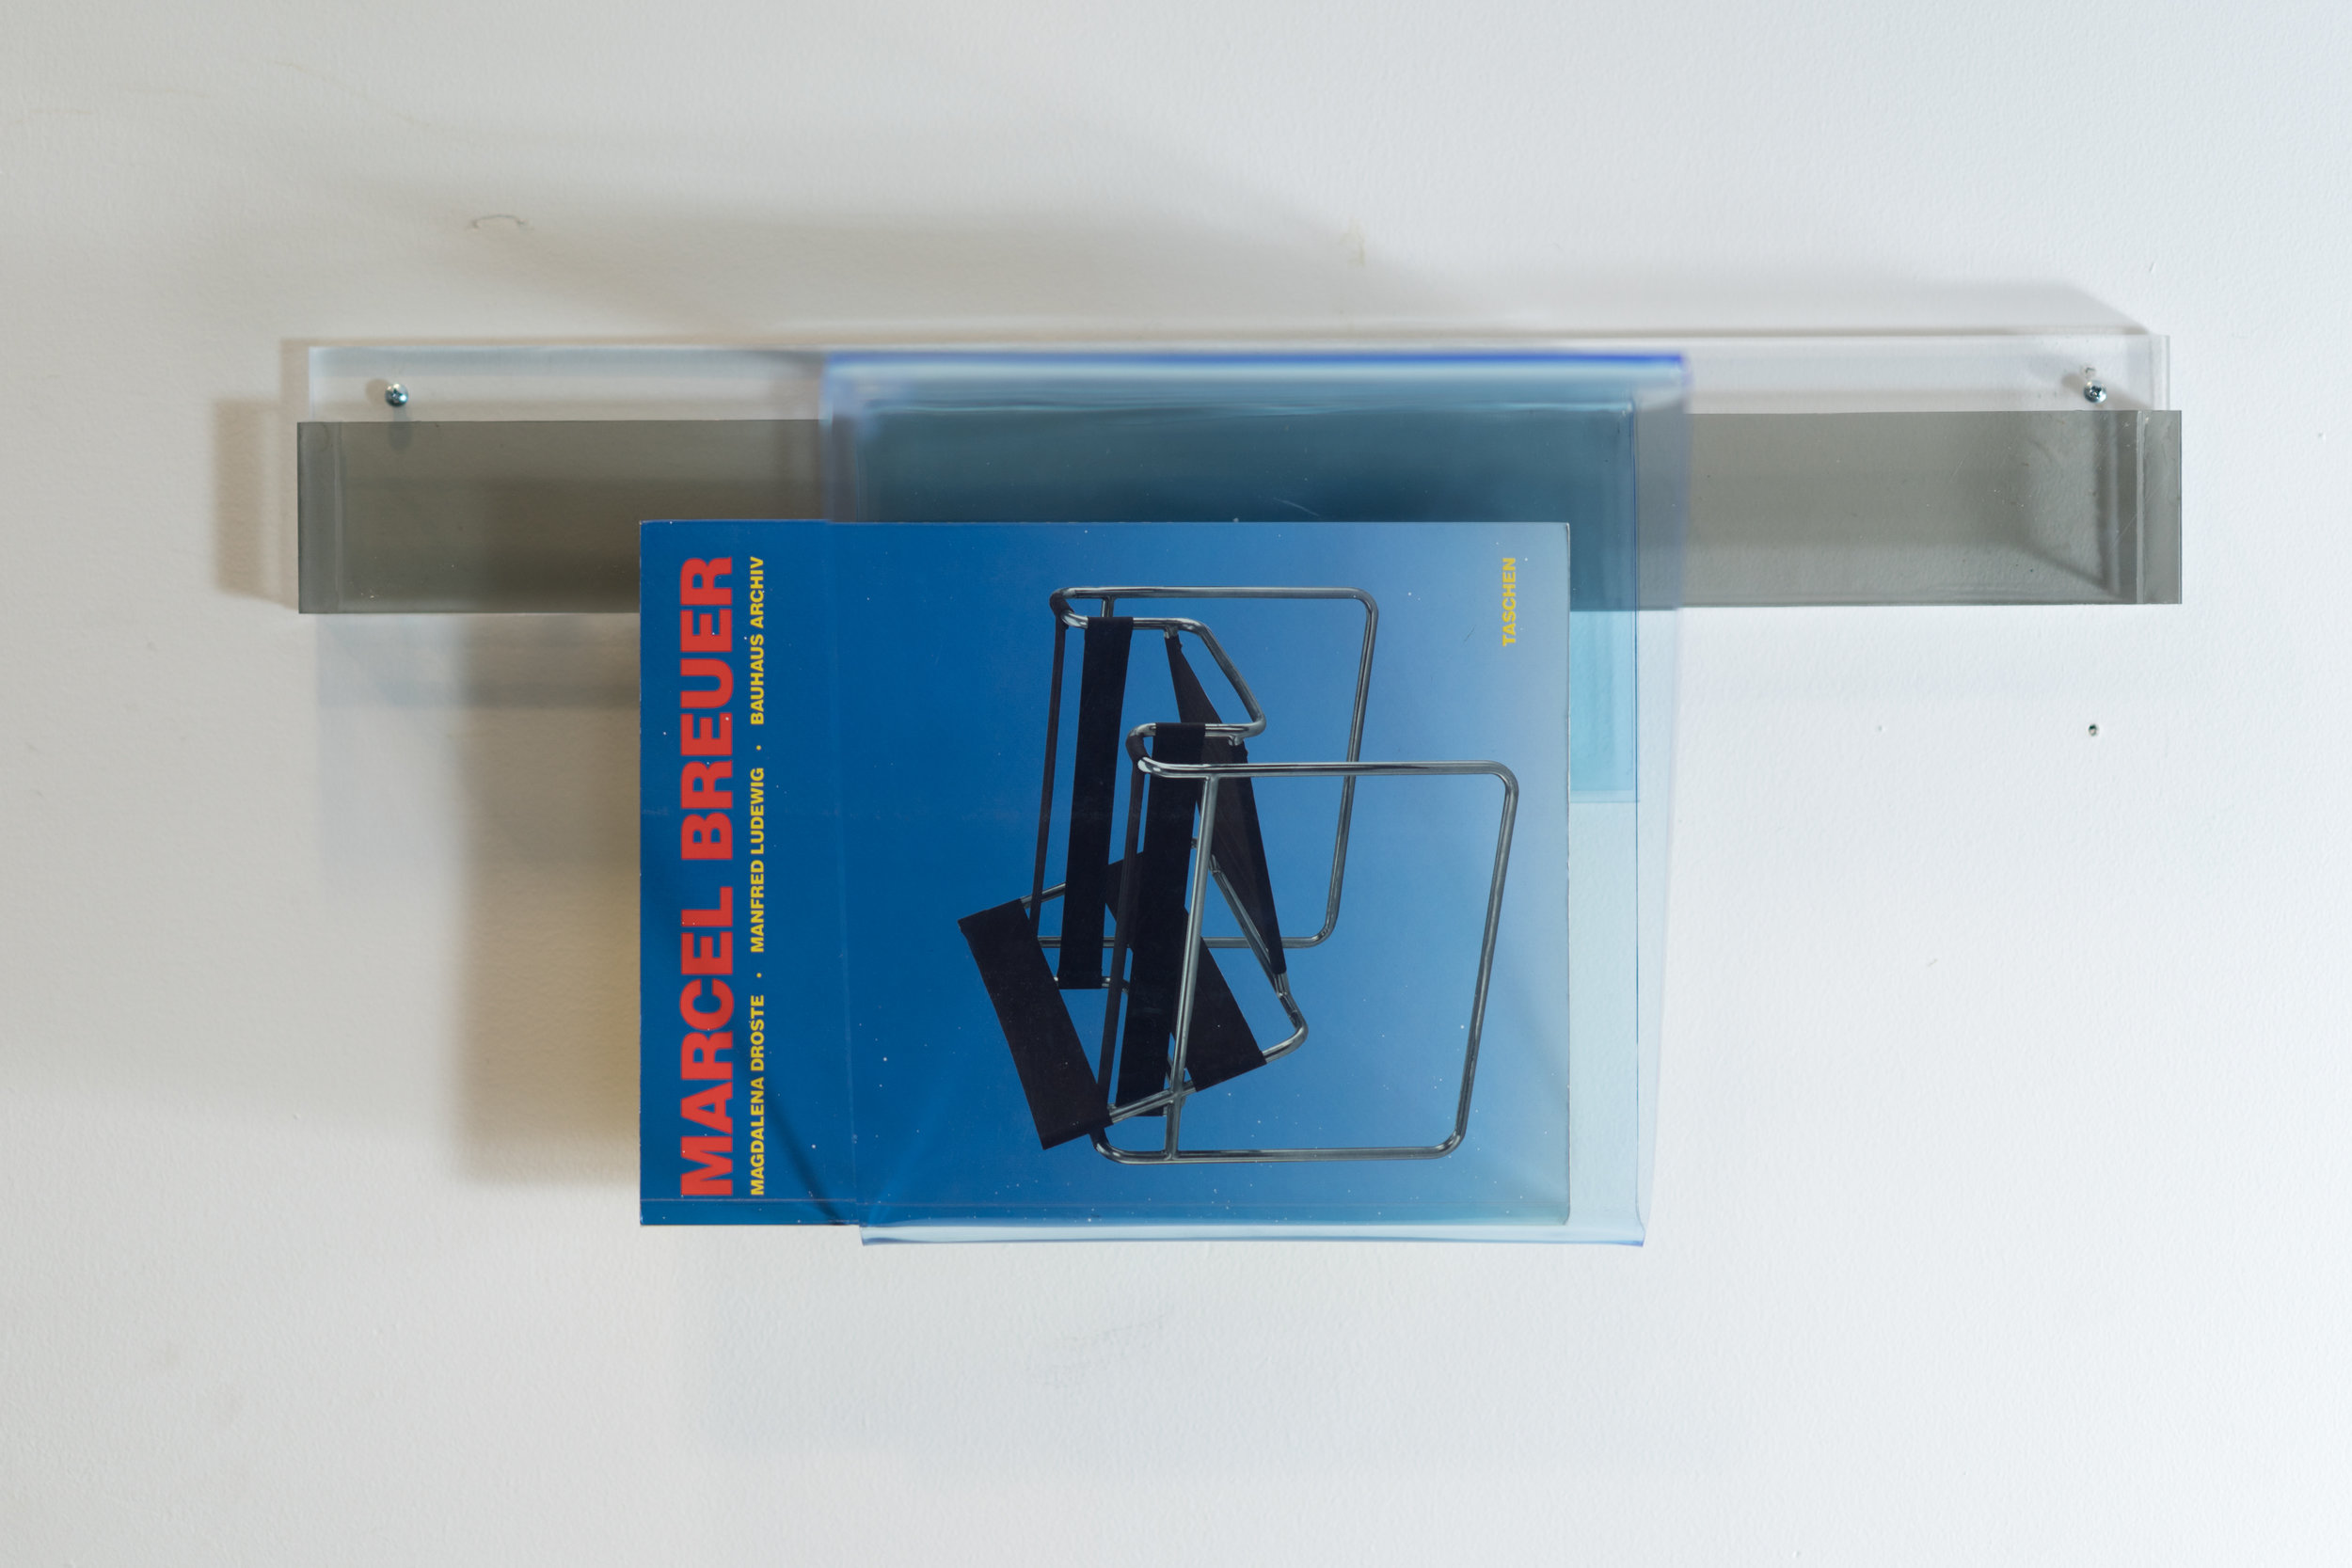 DSC06896-4.JPG